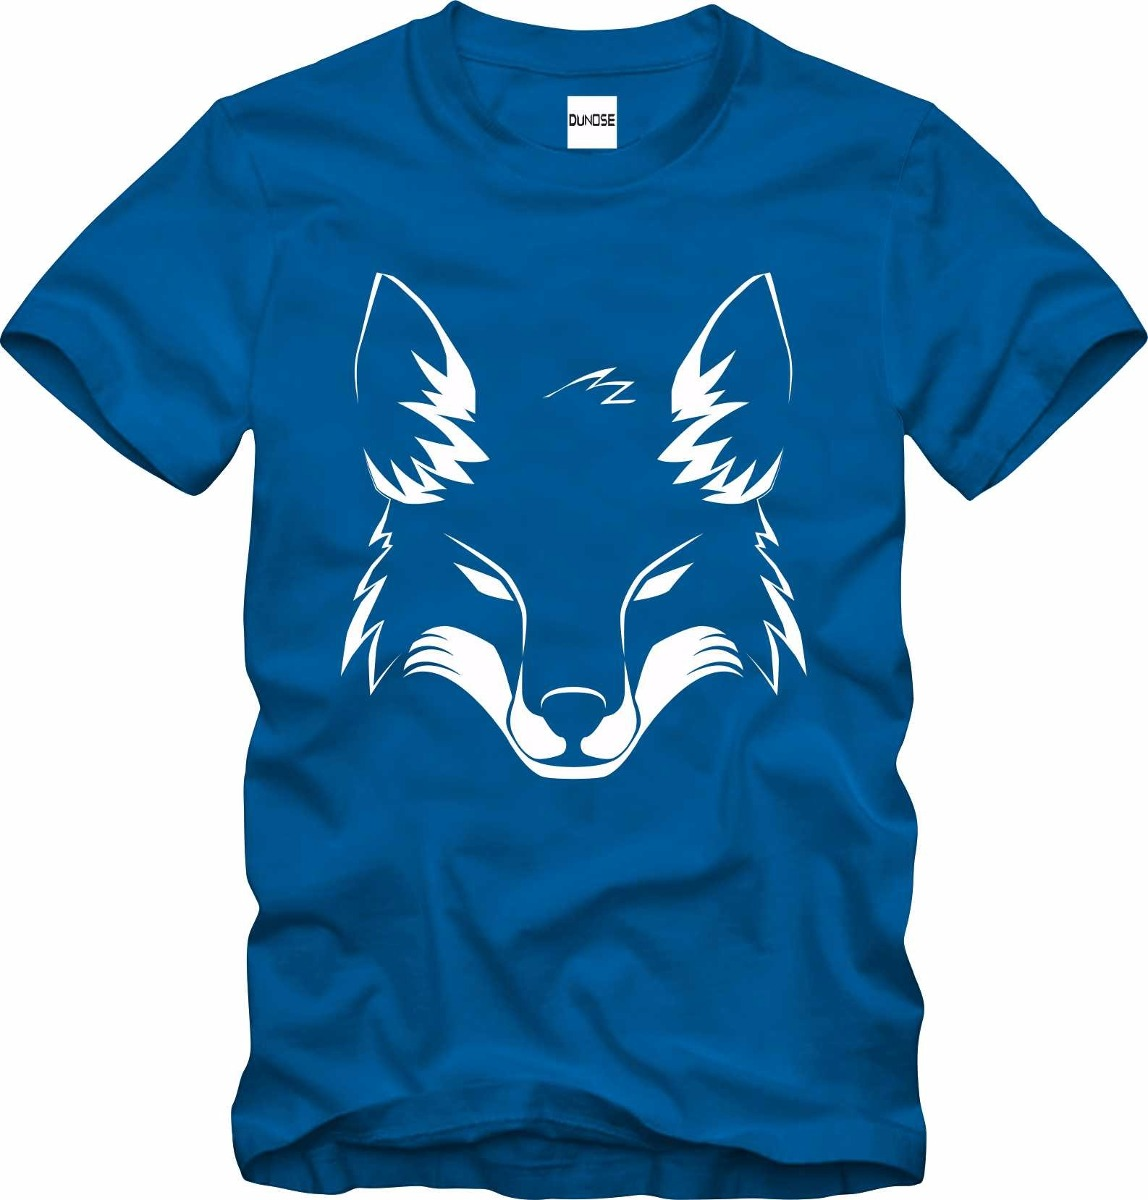 a274c48104 camisa camiseta cruzeiro mascote raposa. Carregando zoom.